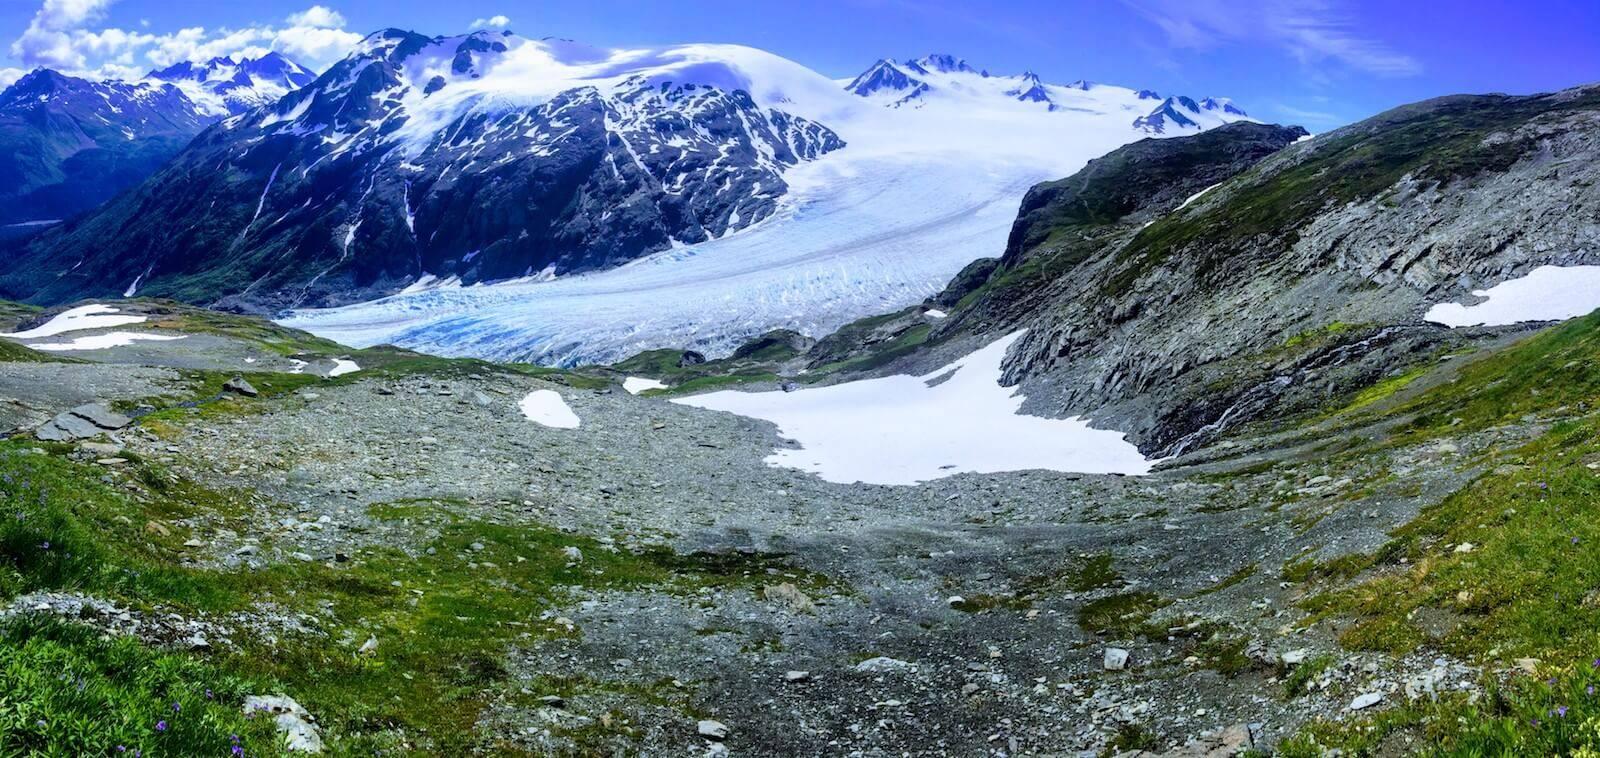 Kenai fjords national park coupons